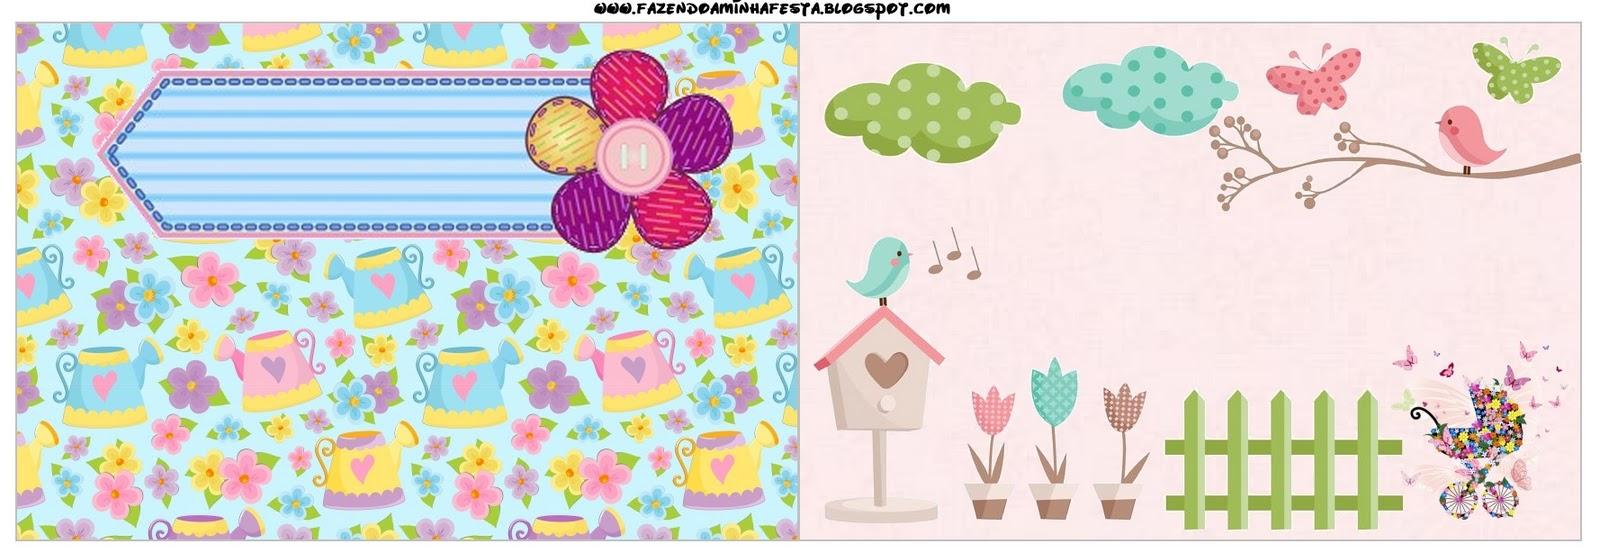 fotos de aniversario tema jardim encantado : fotos de aniversario tema jardim encantado: Festas Infantis: Kit de festa Personalizado com tema Jardim Encantado